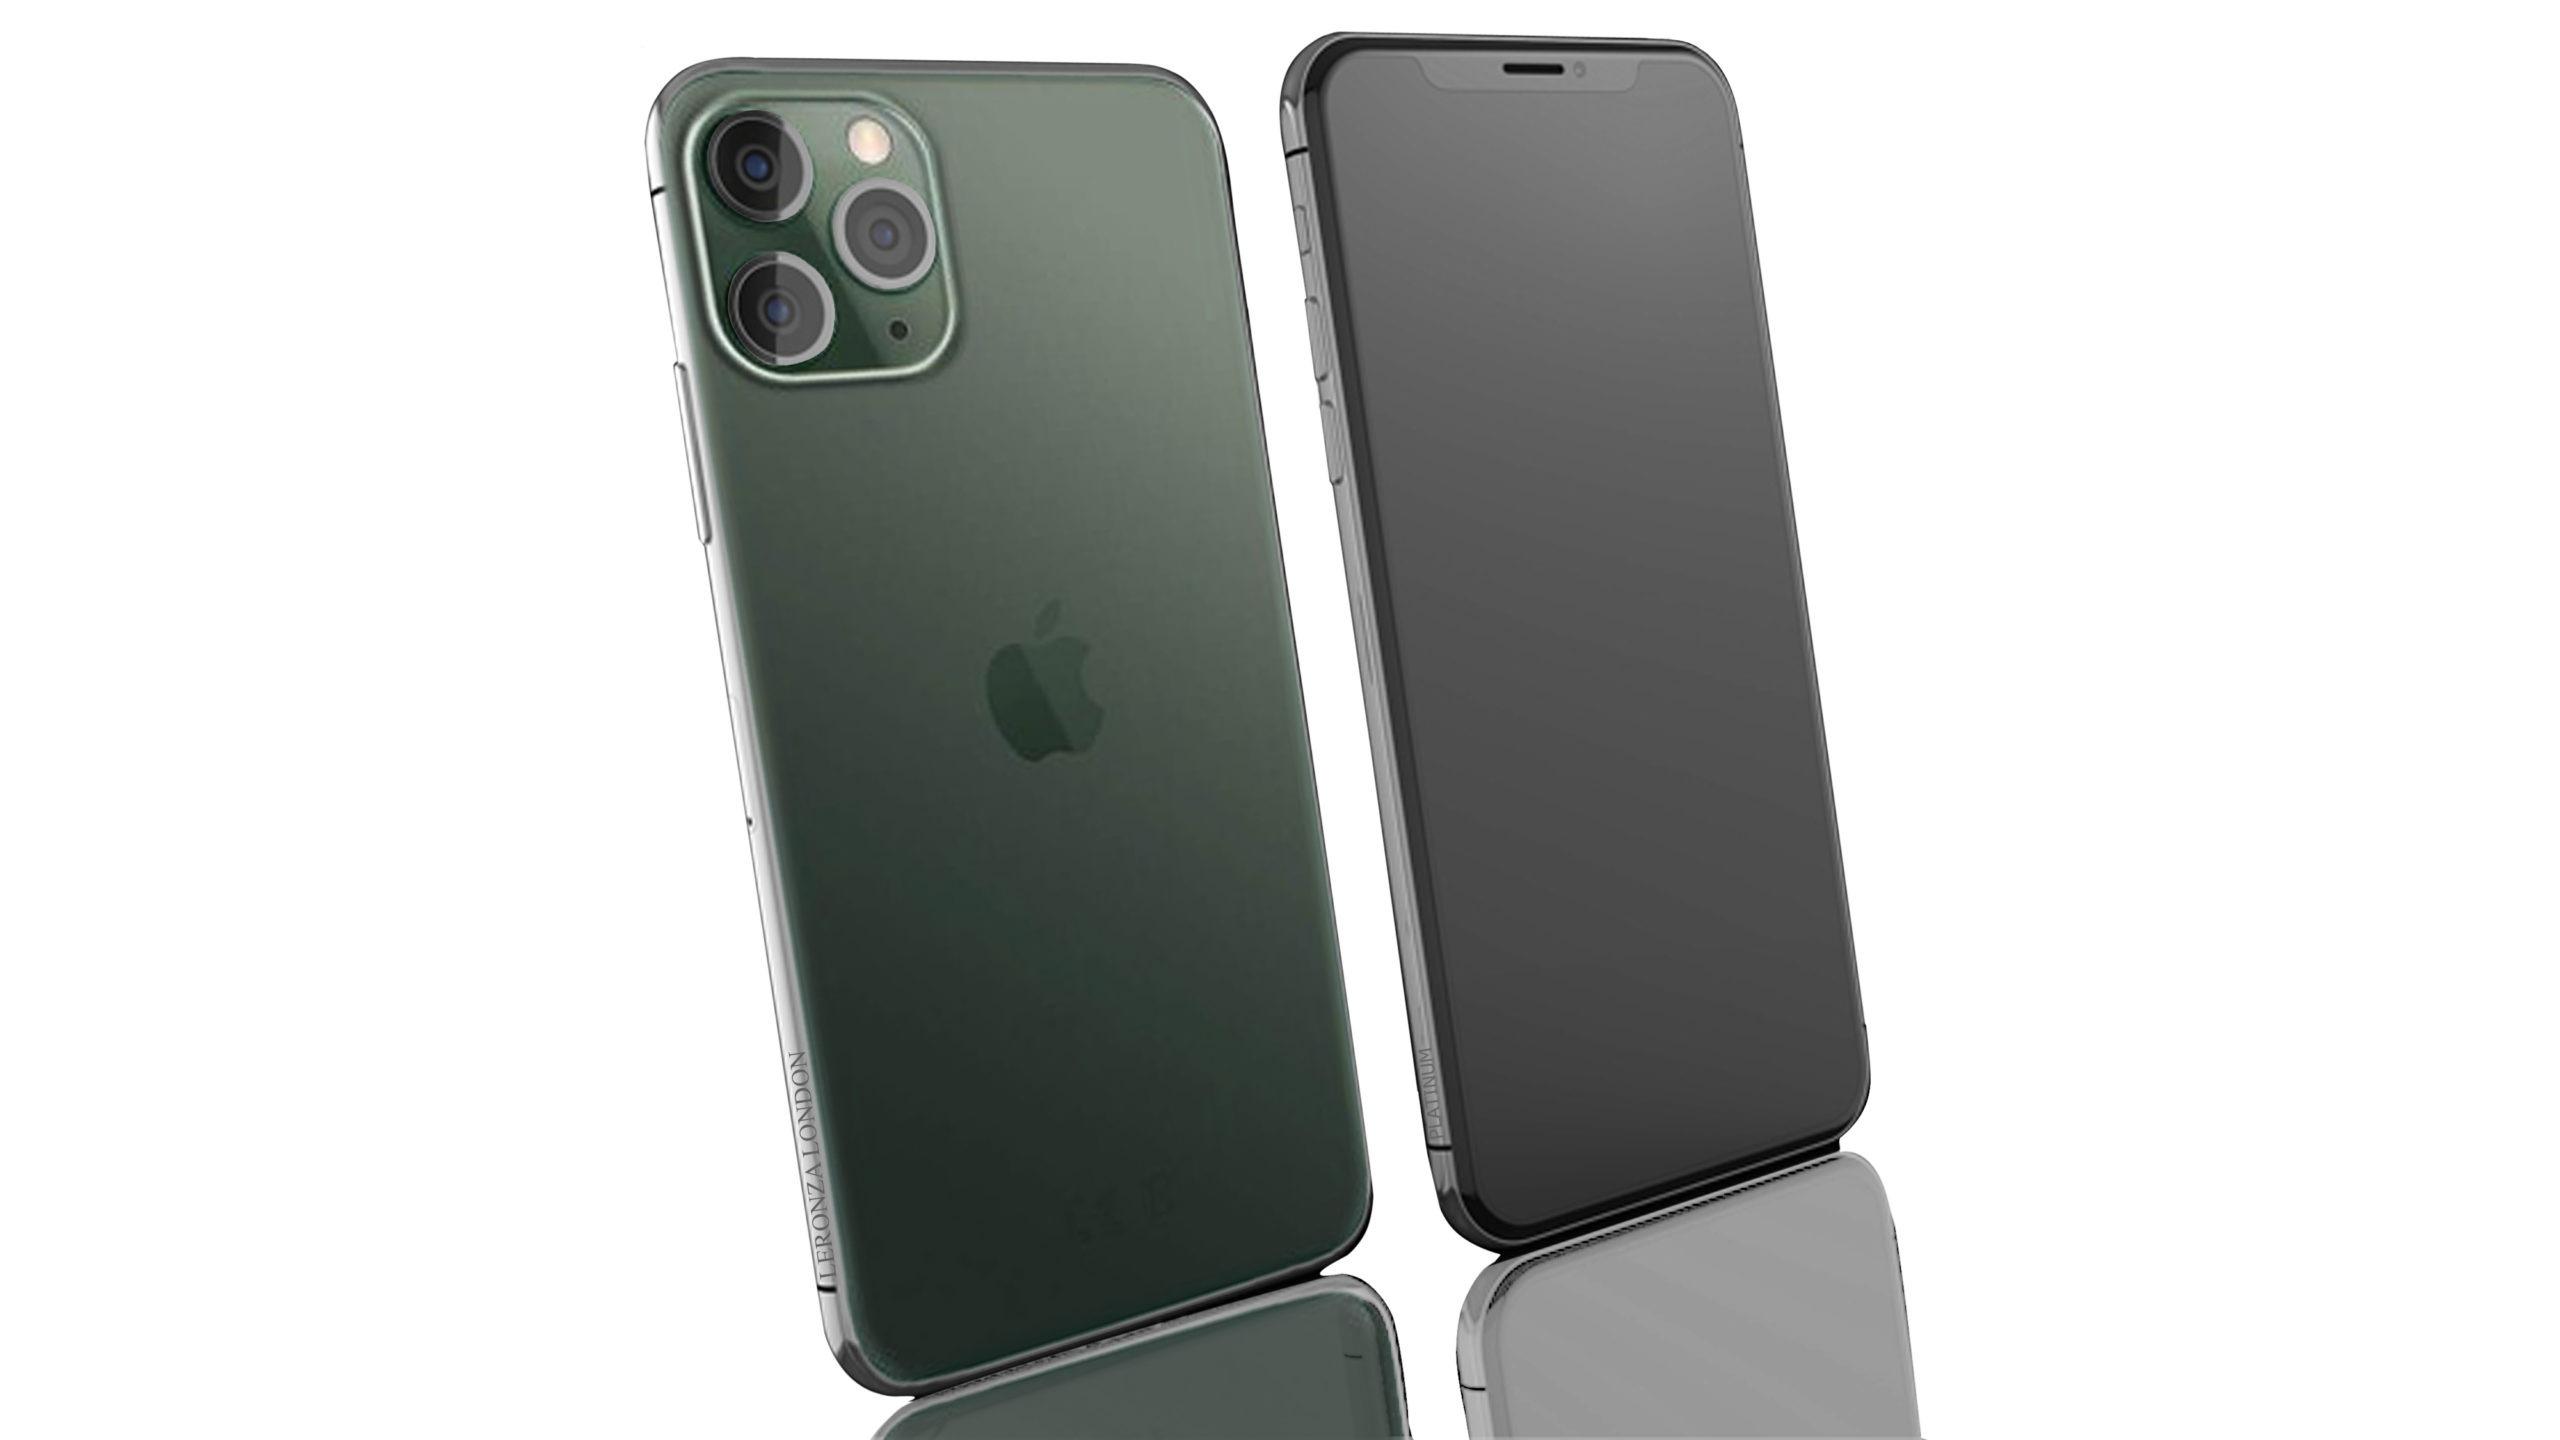 Platinum Midnight Green Iphone 11 Pro And 11 Pro Max Leronza